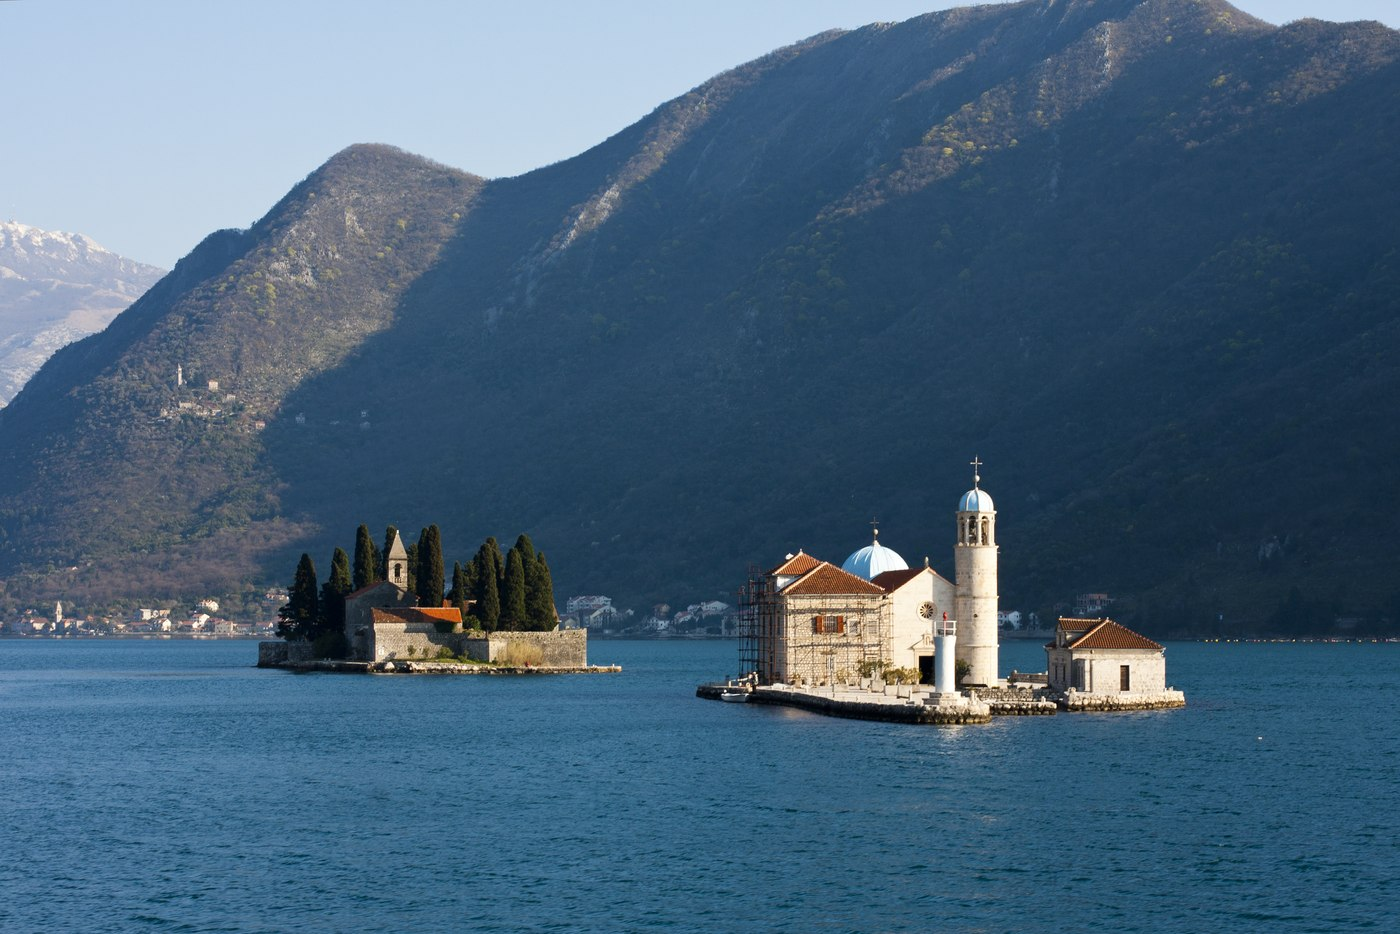 Motor yacht JO cruising in the bay of Kotor, Montenegro